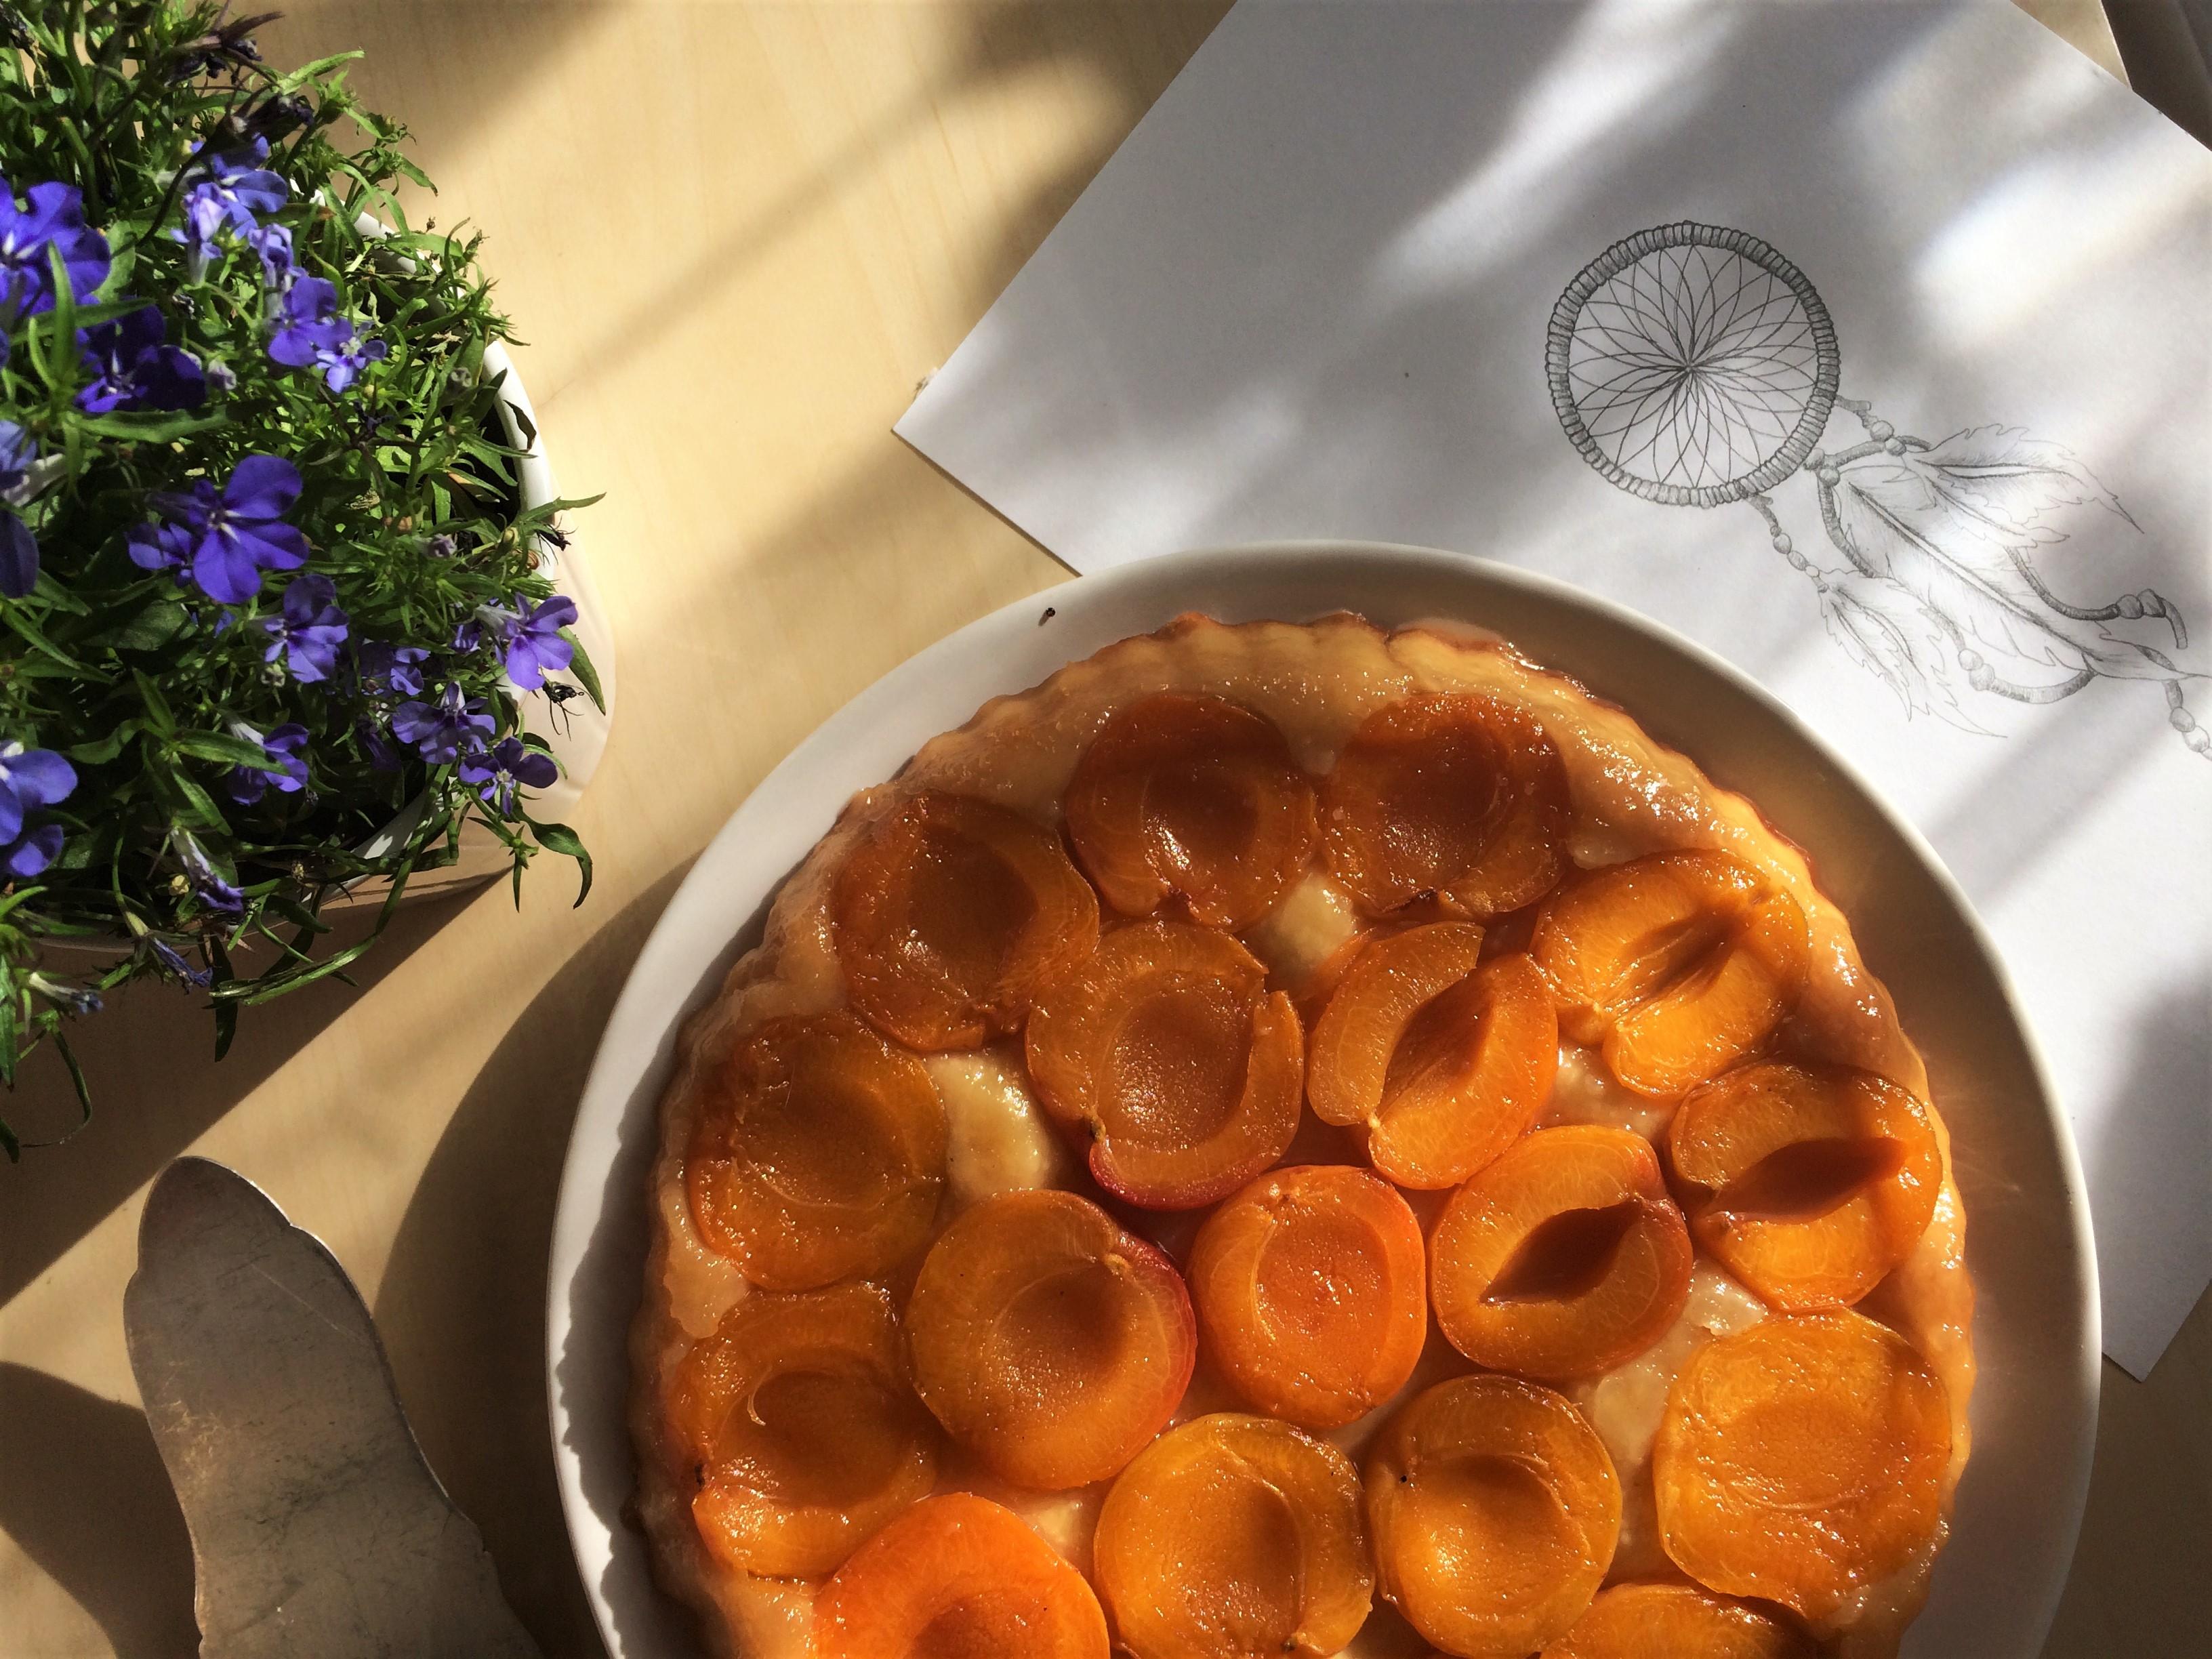 Upside down – Apricot tarte tatin